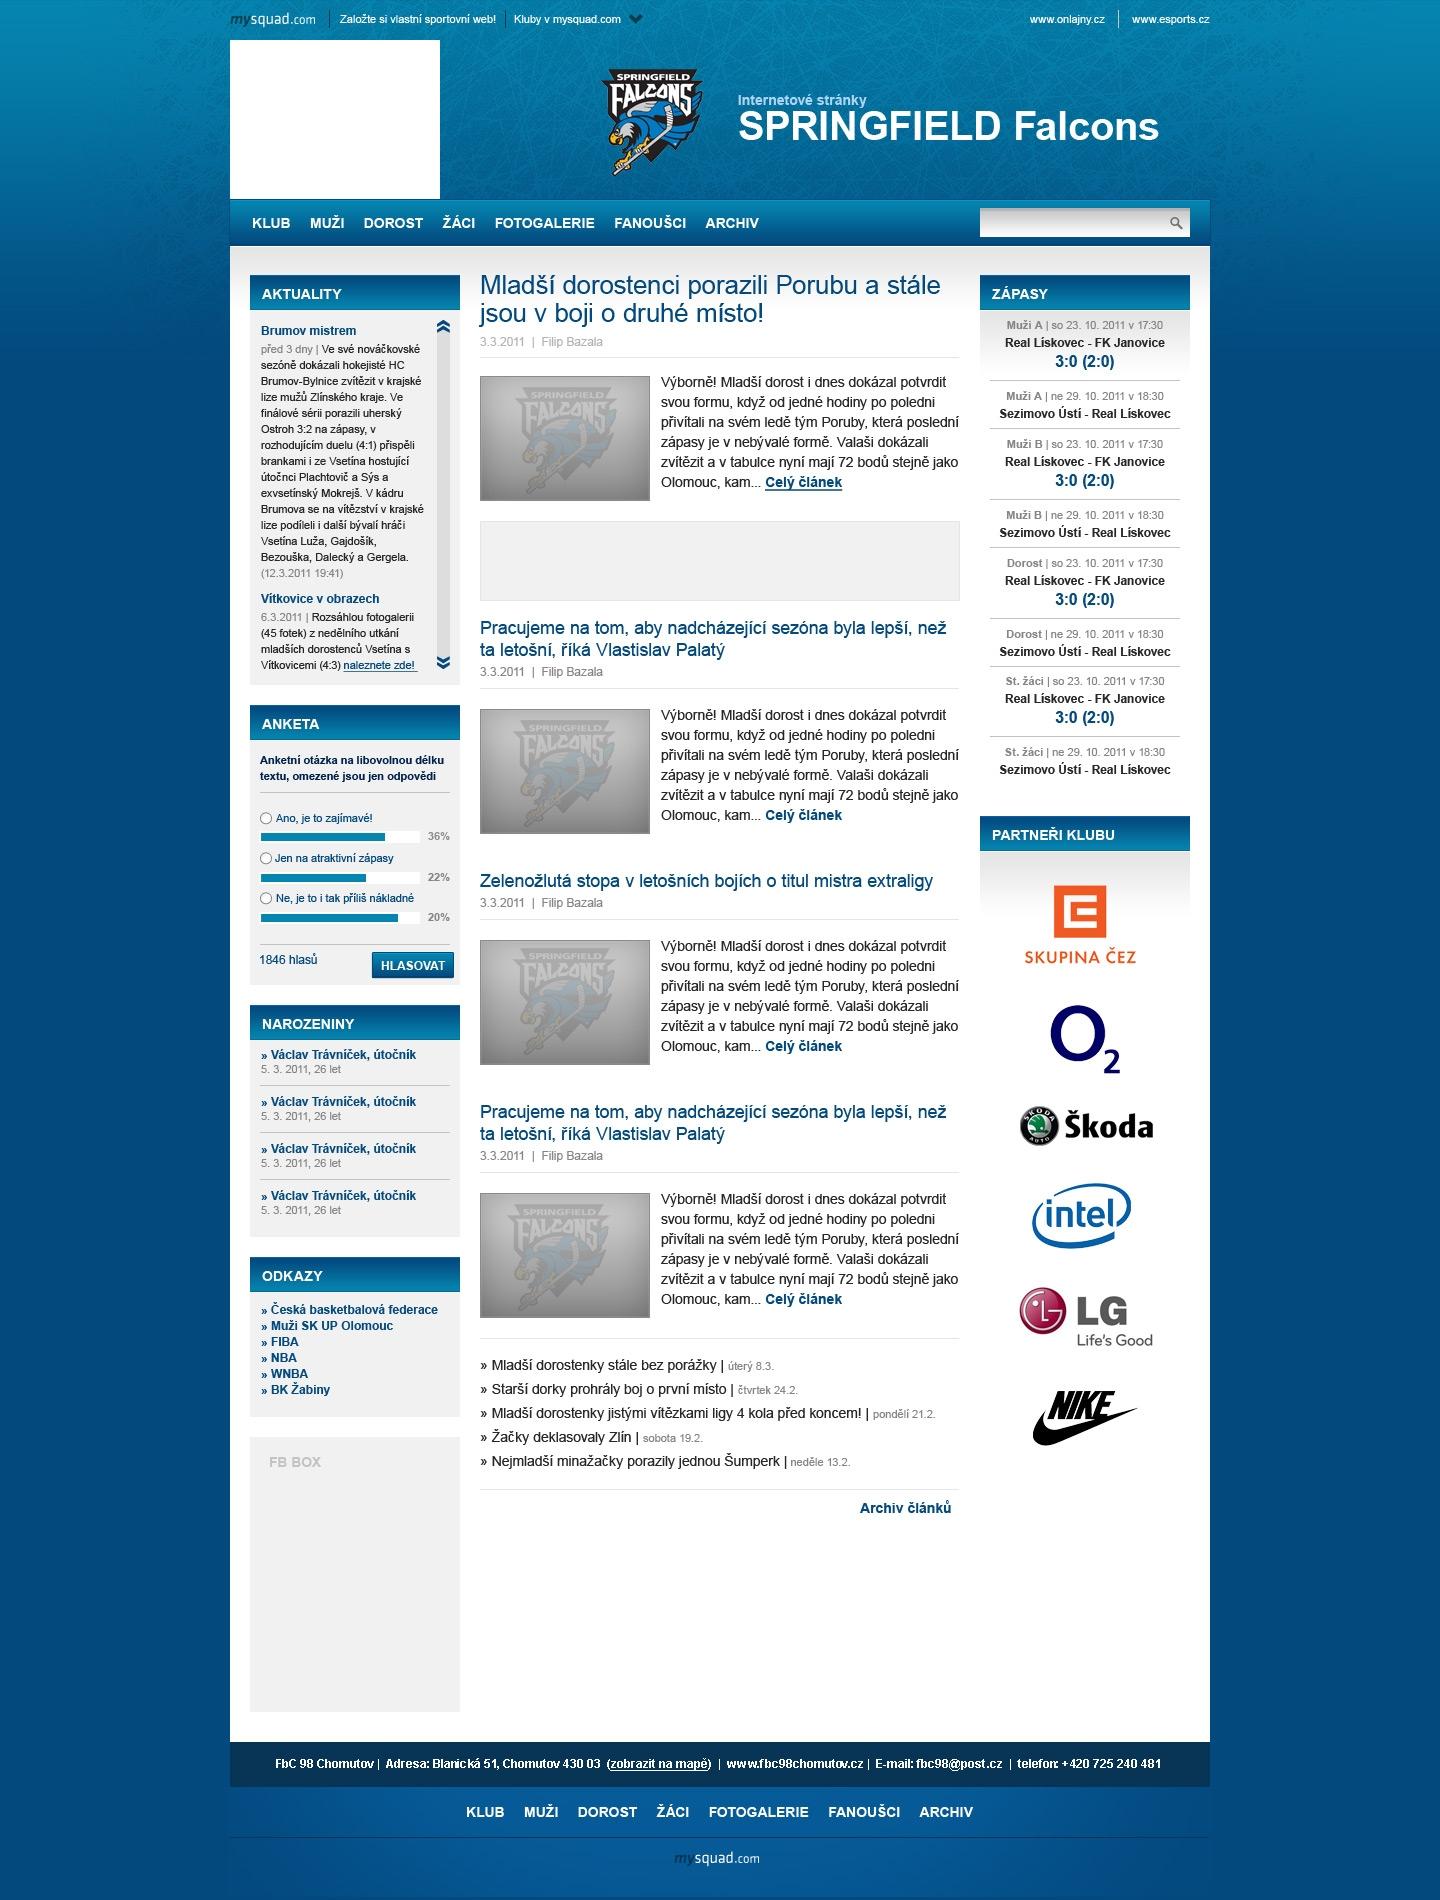 http://myteamweb.laura.esports.cz/wp-content/uploads/ether/hokej_v1_index_mysquad_sablona_b_foto-thumb0x0.jpg